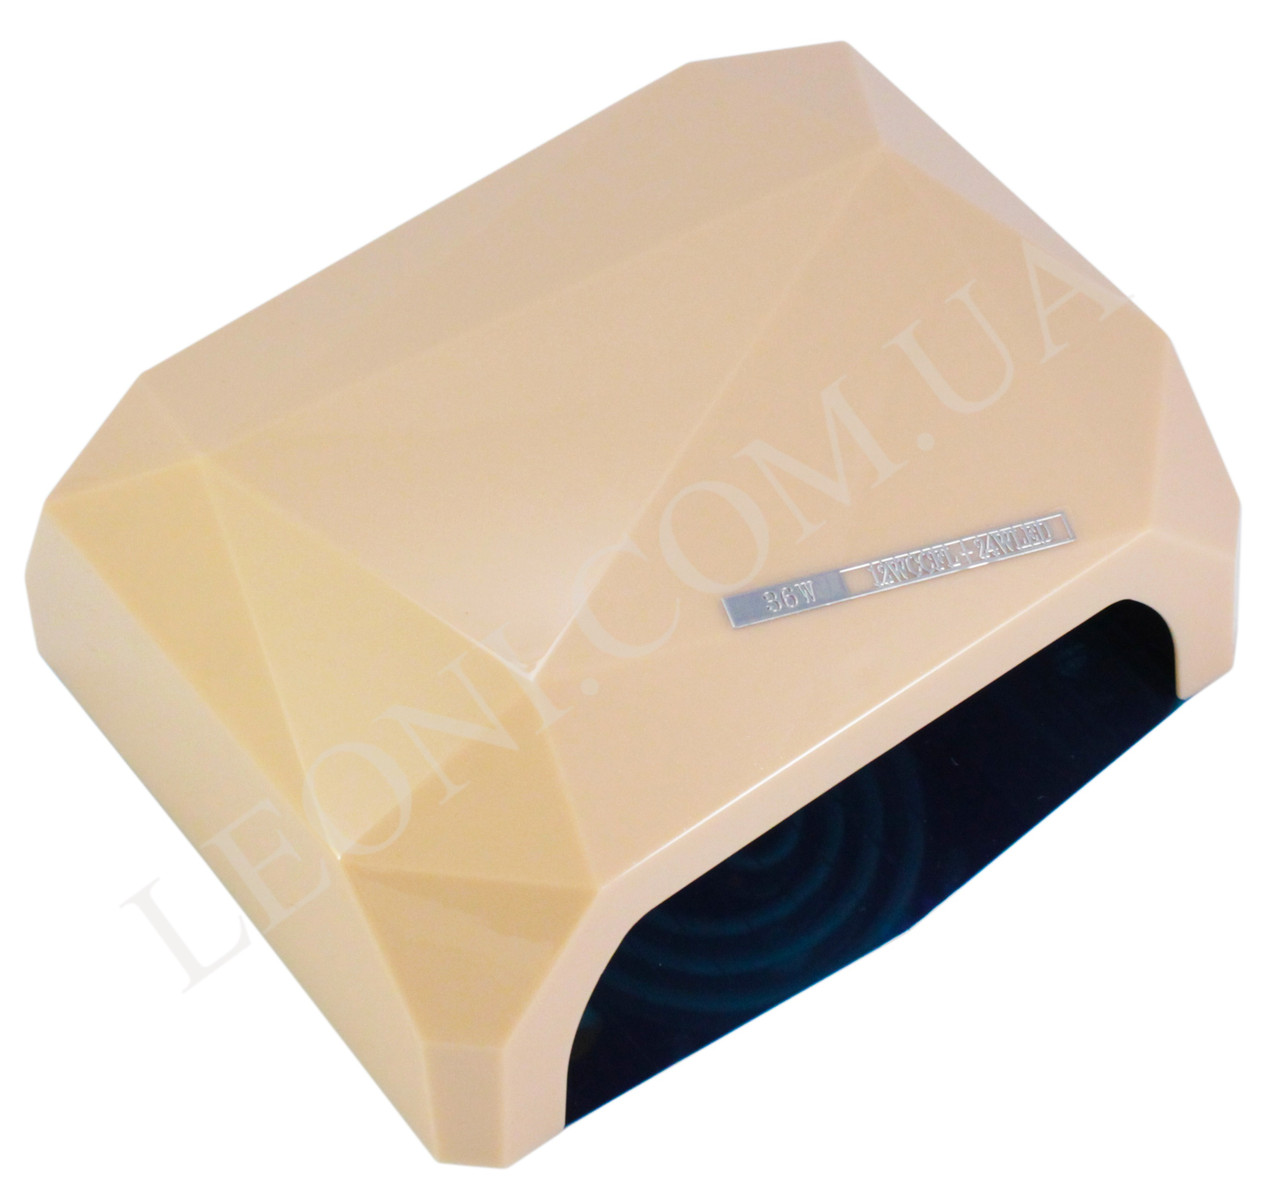 Лампа для маникюра и педикюра комбинированная Led+CCFL Diamond 36W (Бежевая)